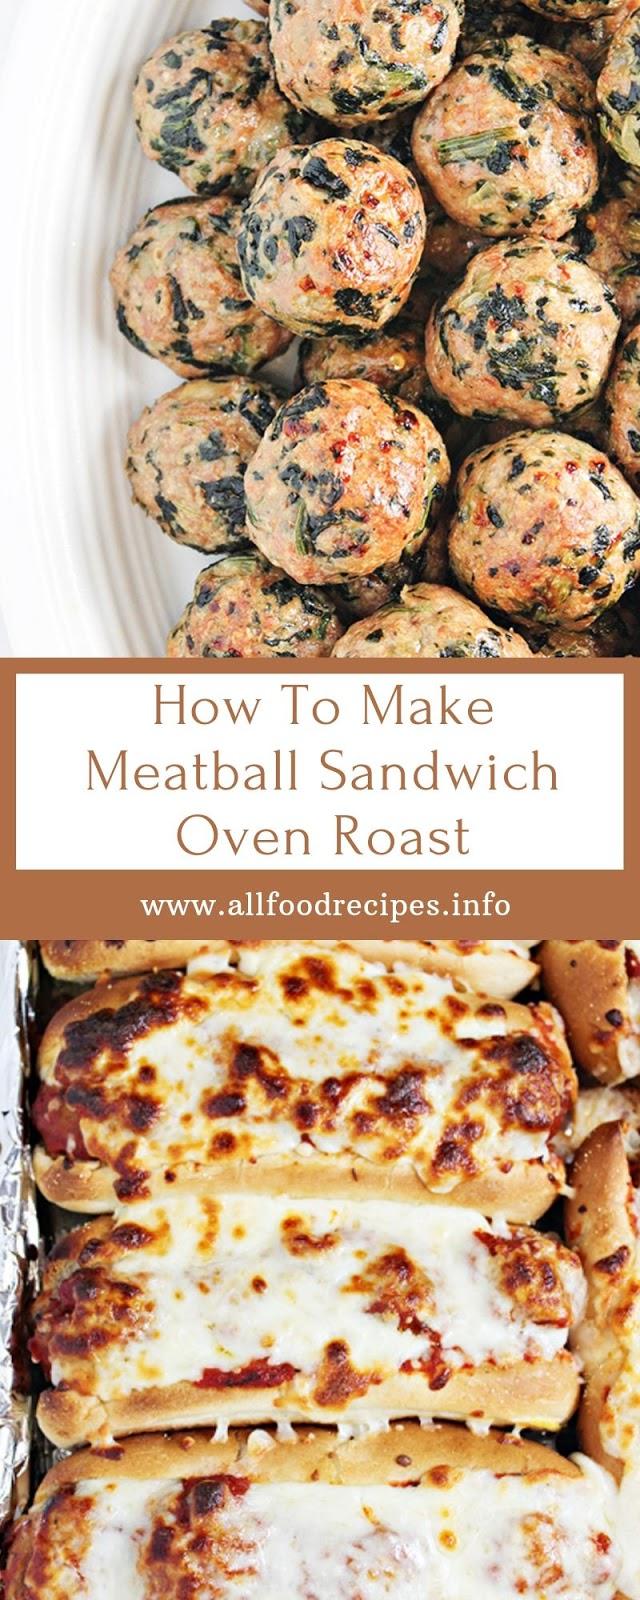 How To Make Meatball Sandwich Oven Roast